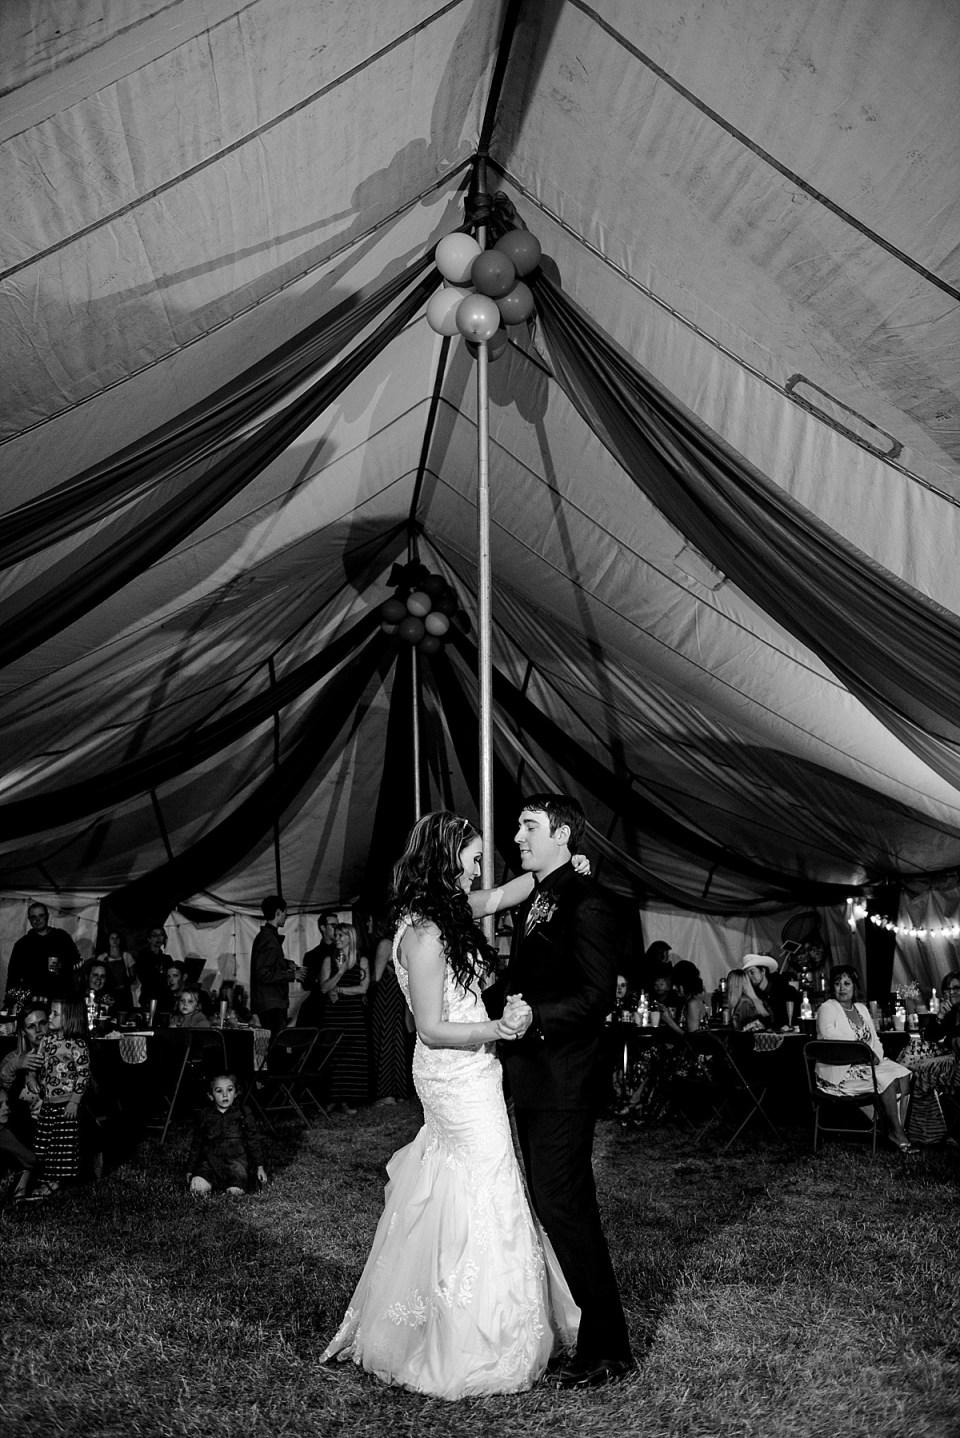 Rustic Alberta Outdoor Wedding   Red Deer Photographers   Stettler Photographers   Mason jars and paper lanterns wedding decor   Fishing themed wedding reception